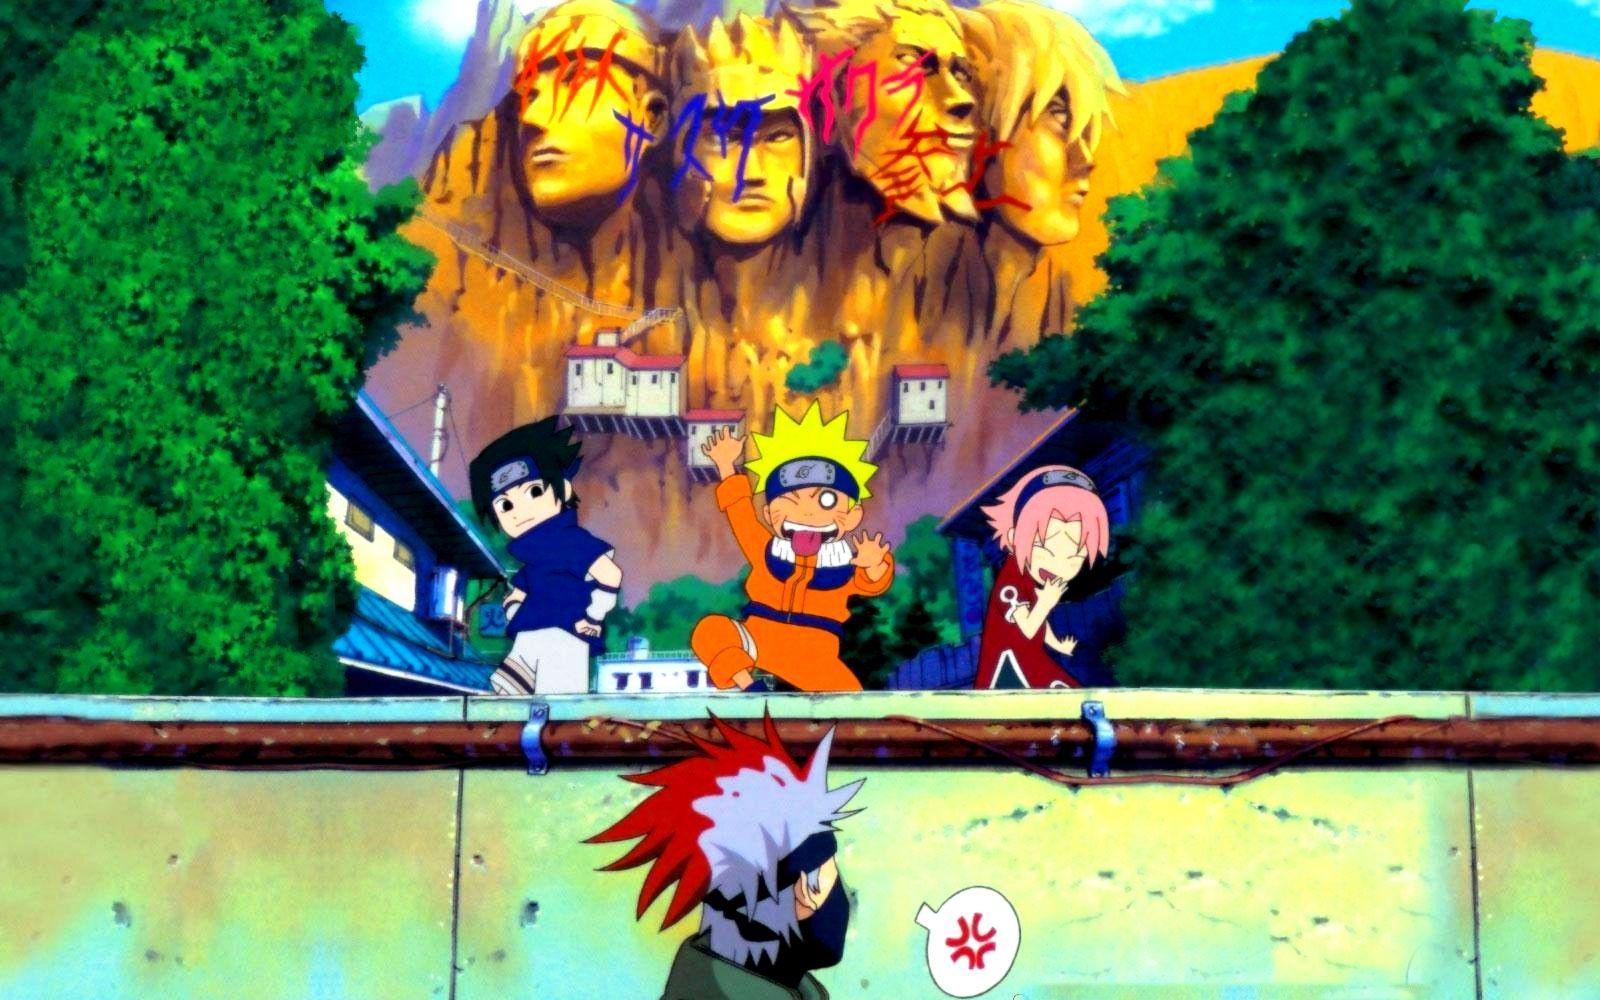 Kakashi sakura sasuke naruto wallpaper forwallpaper com html code - 1087 Naruto Hd Wallpapers Backgrounds Wallpaper Abyss Download Wallpaper Pinterest Hd Wallpaper Wallpaper And Wallpaper Backgrounds